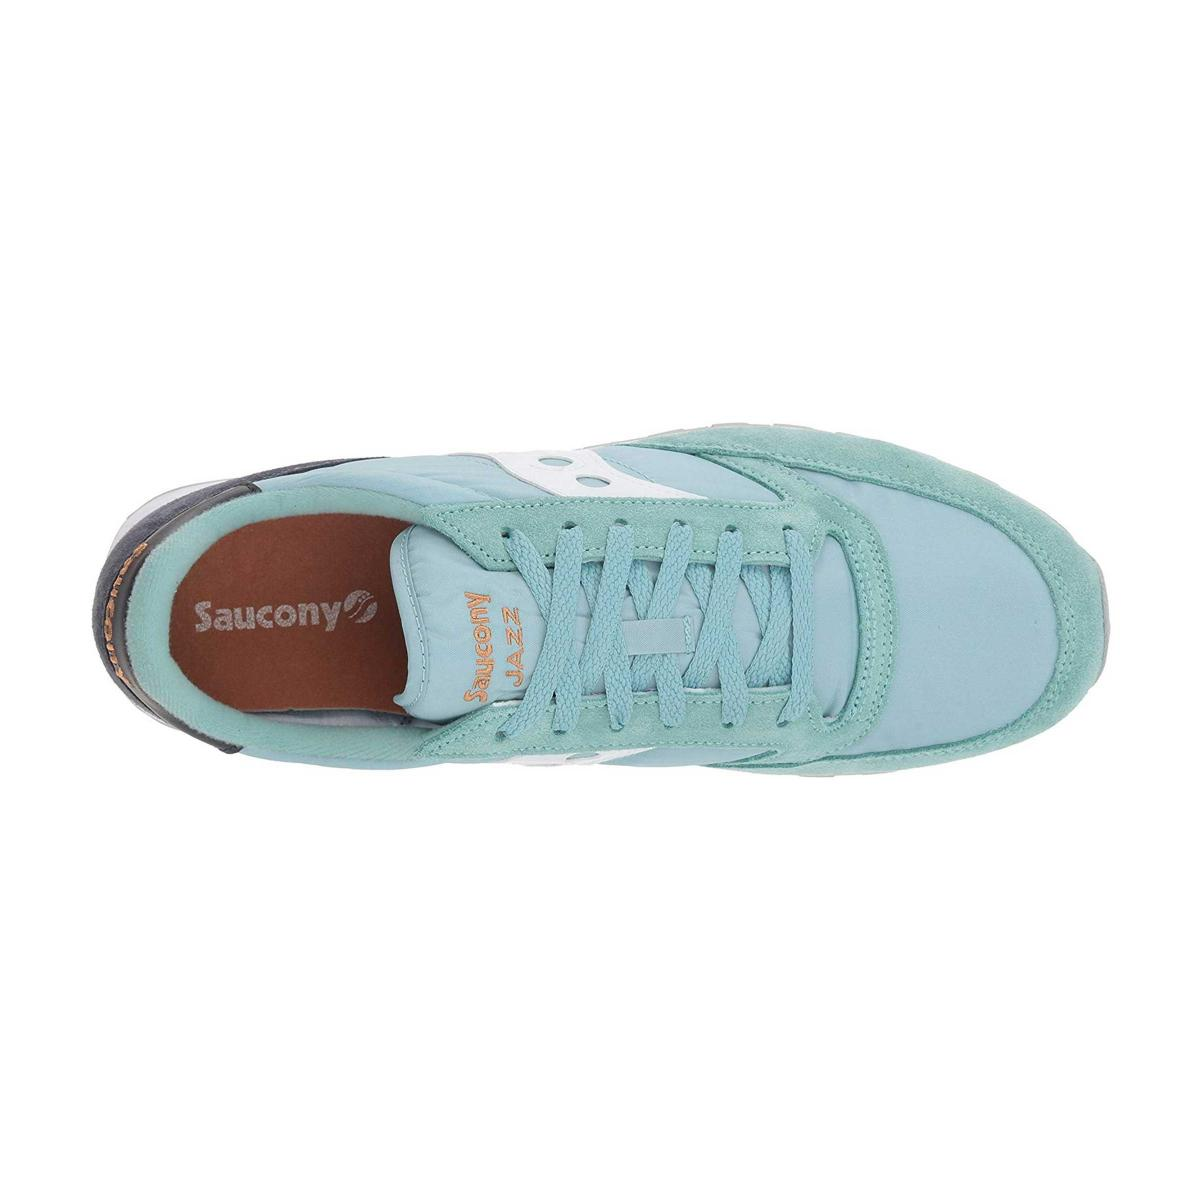 Scarpe Sneakers Saucony Jazz Original Uomo rif. S2044-453